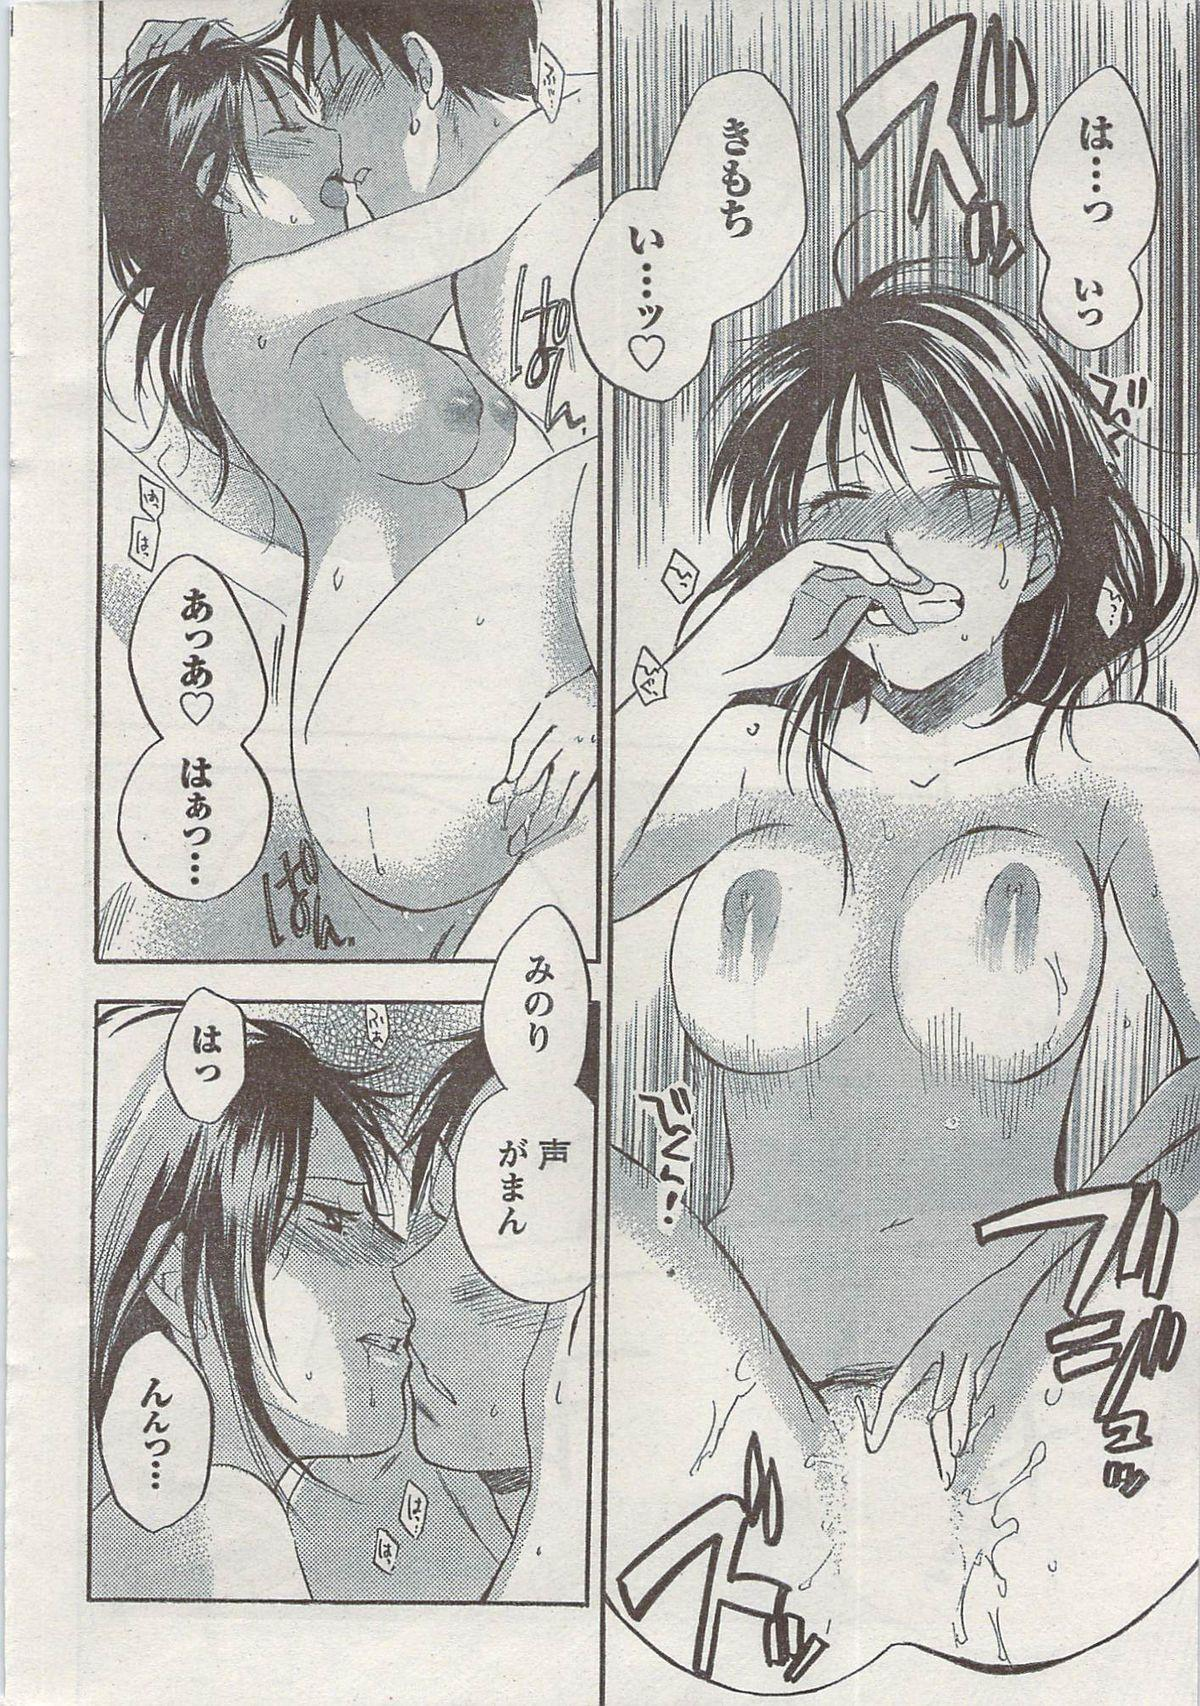 Monthly Vitaman 2007-08 21